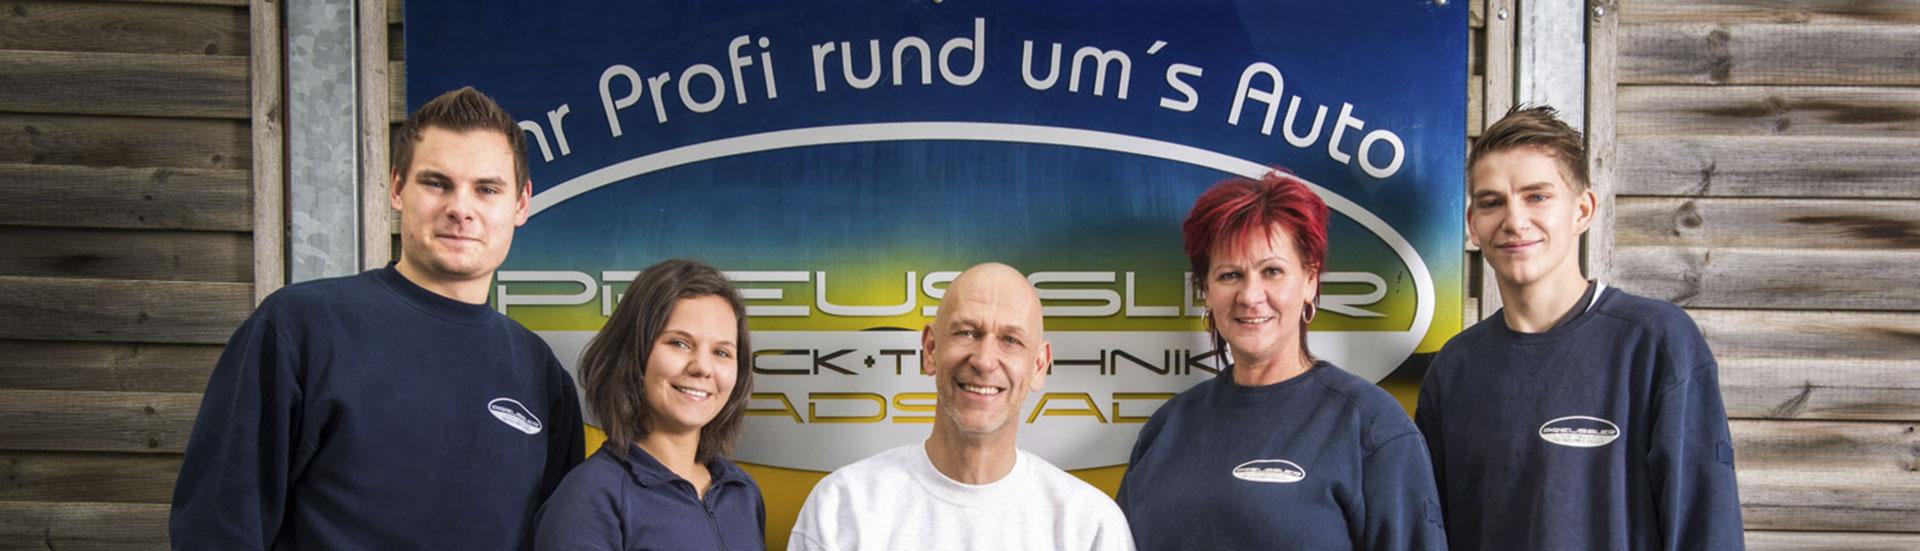 Kfz Fachbetrieb Preussler - Team & Hündin Bora